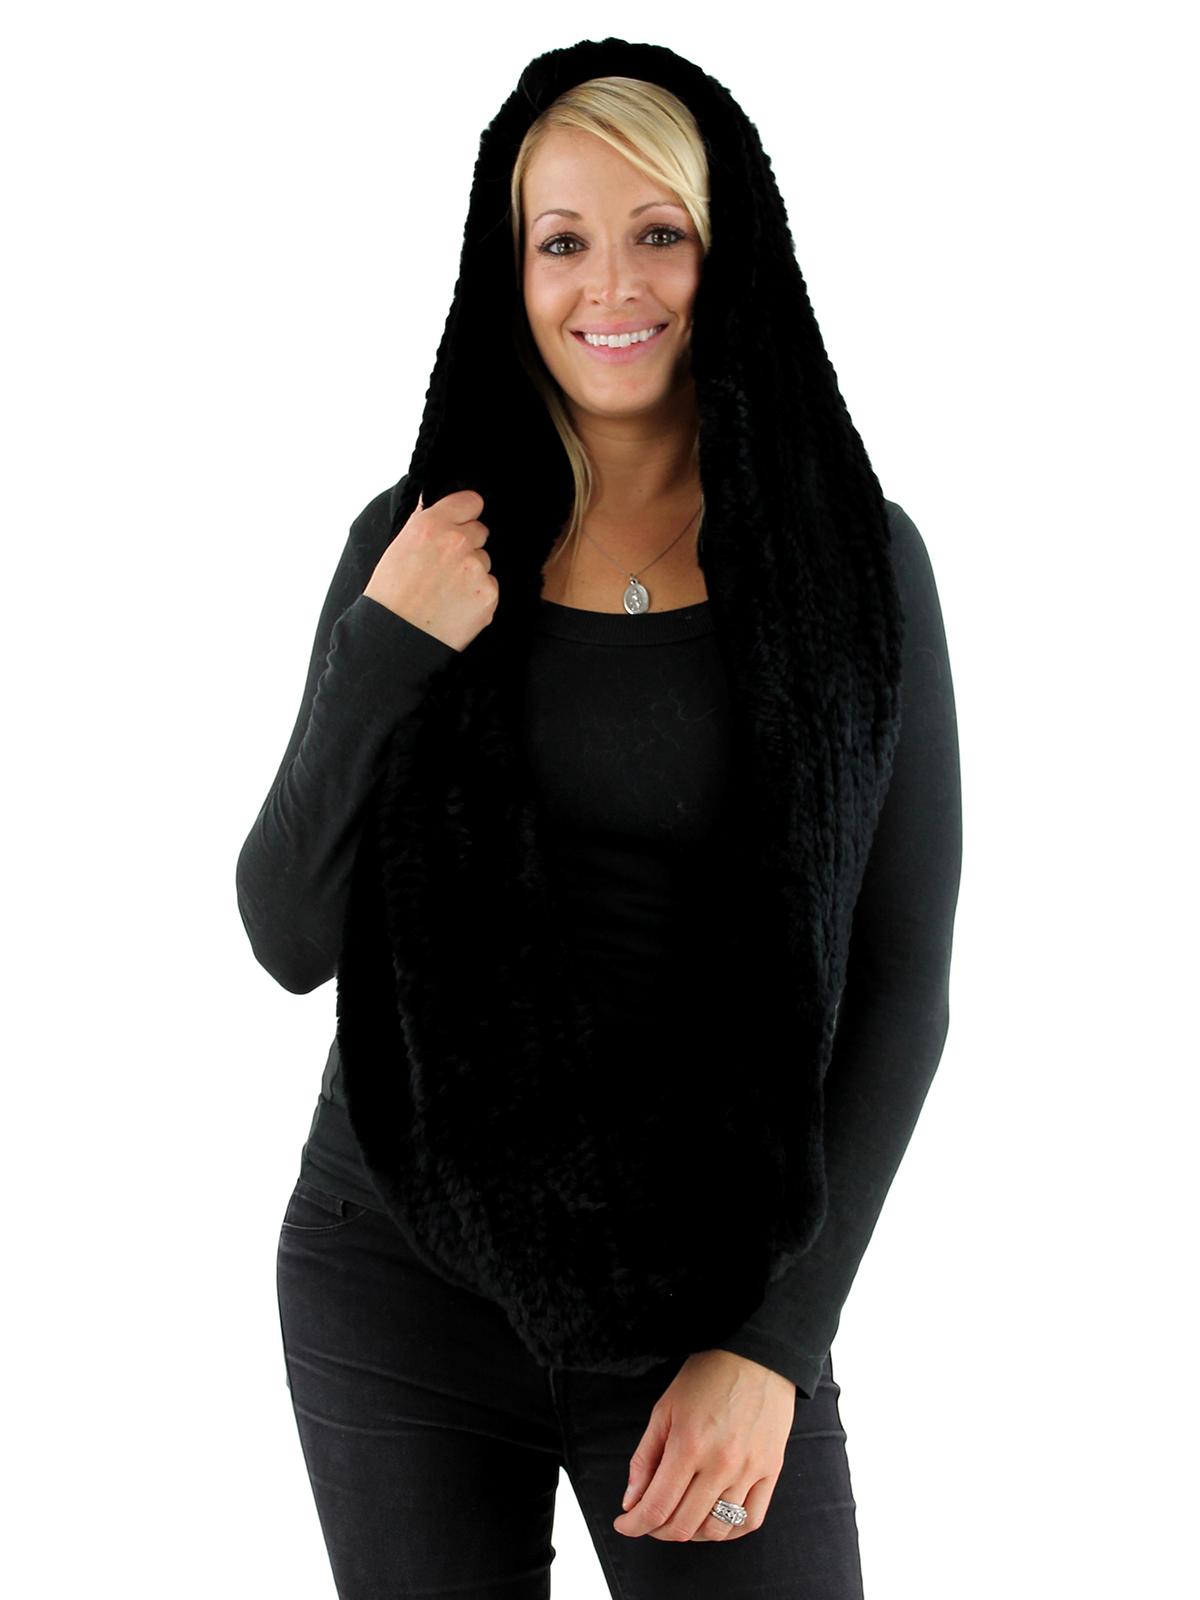 Black Rex Rabbit Fur Infinity Neck Warmer with Hood